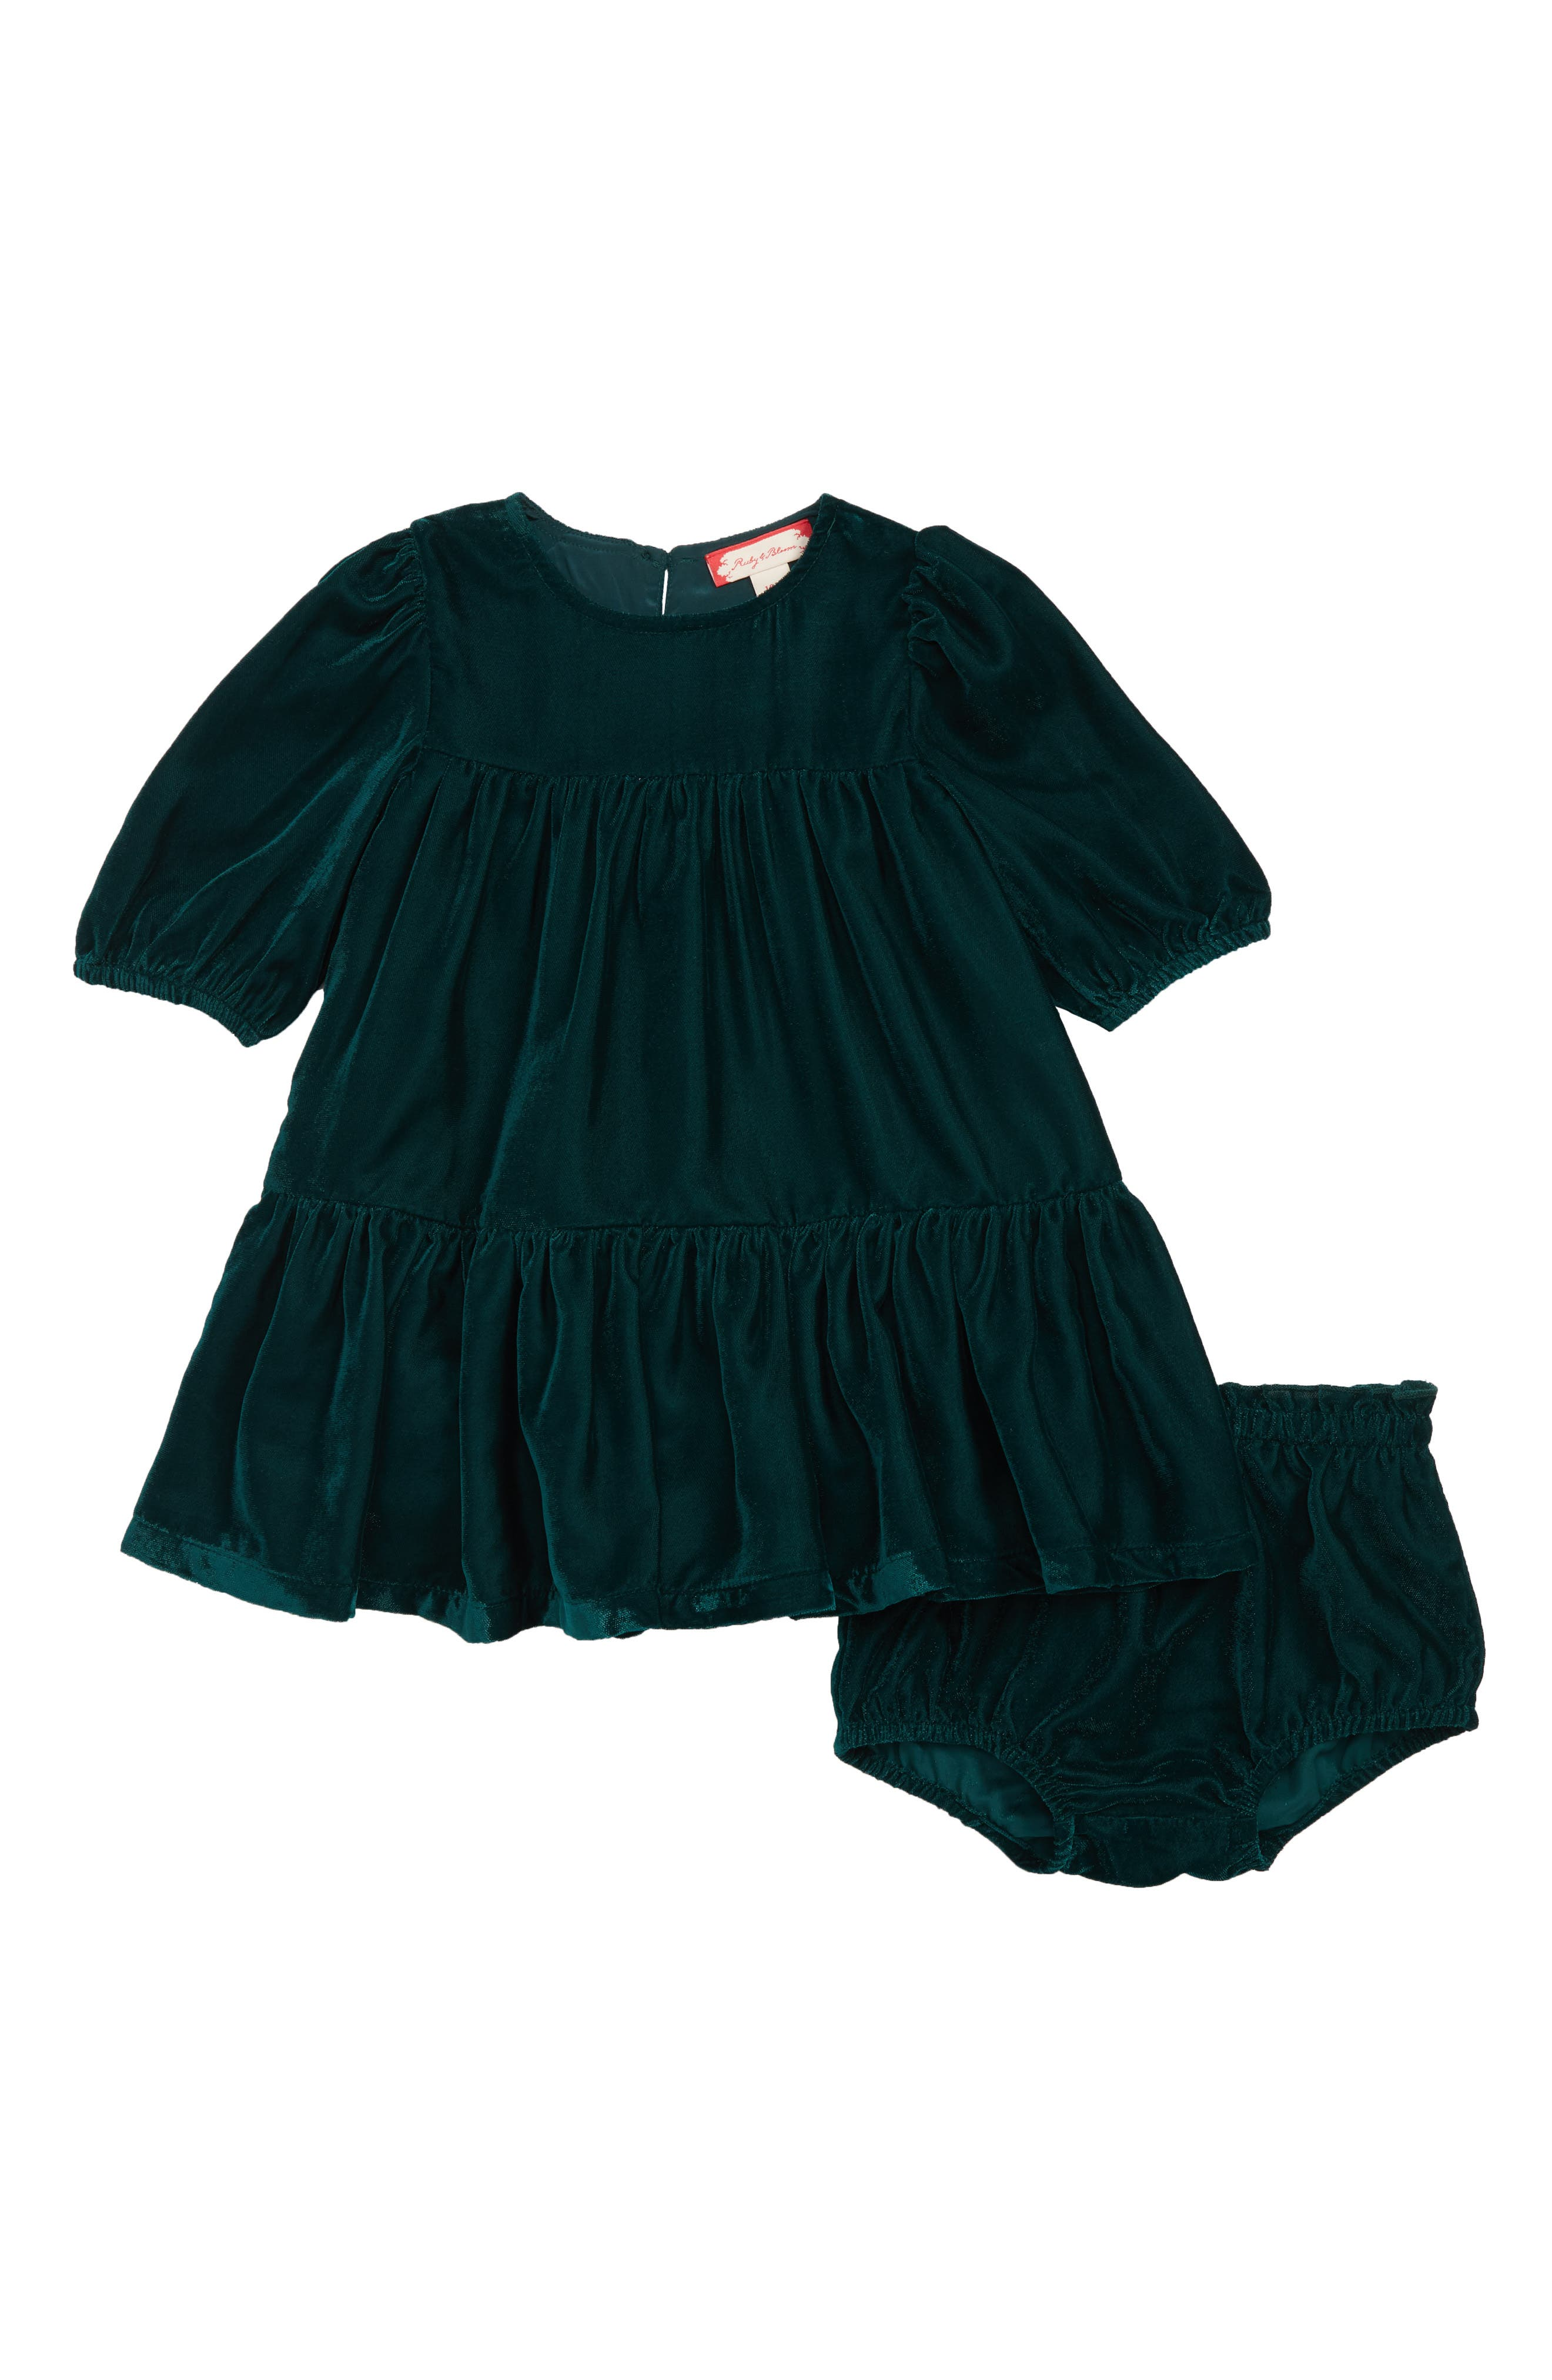 RUBY & BLOOM Tiered Velvet Dress, Main, color, 301